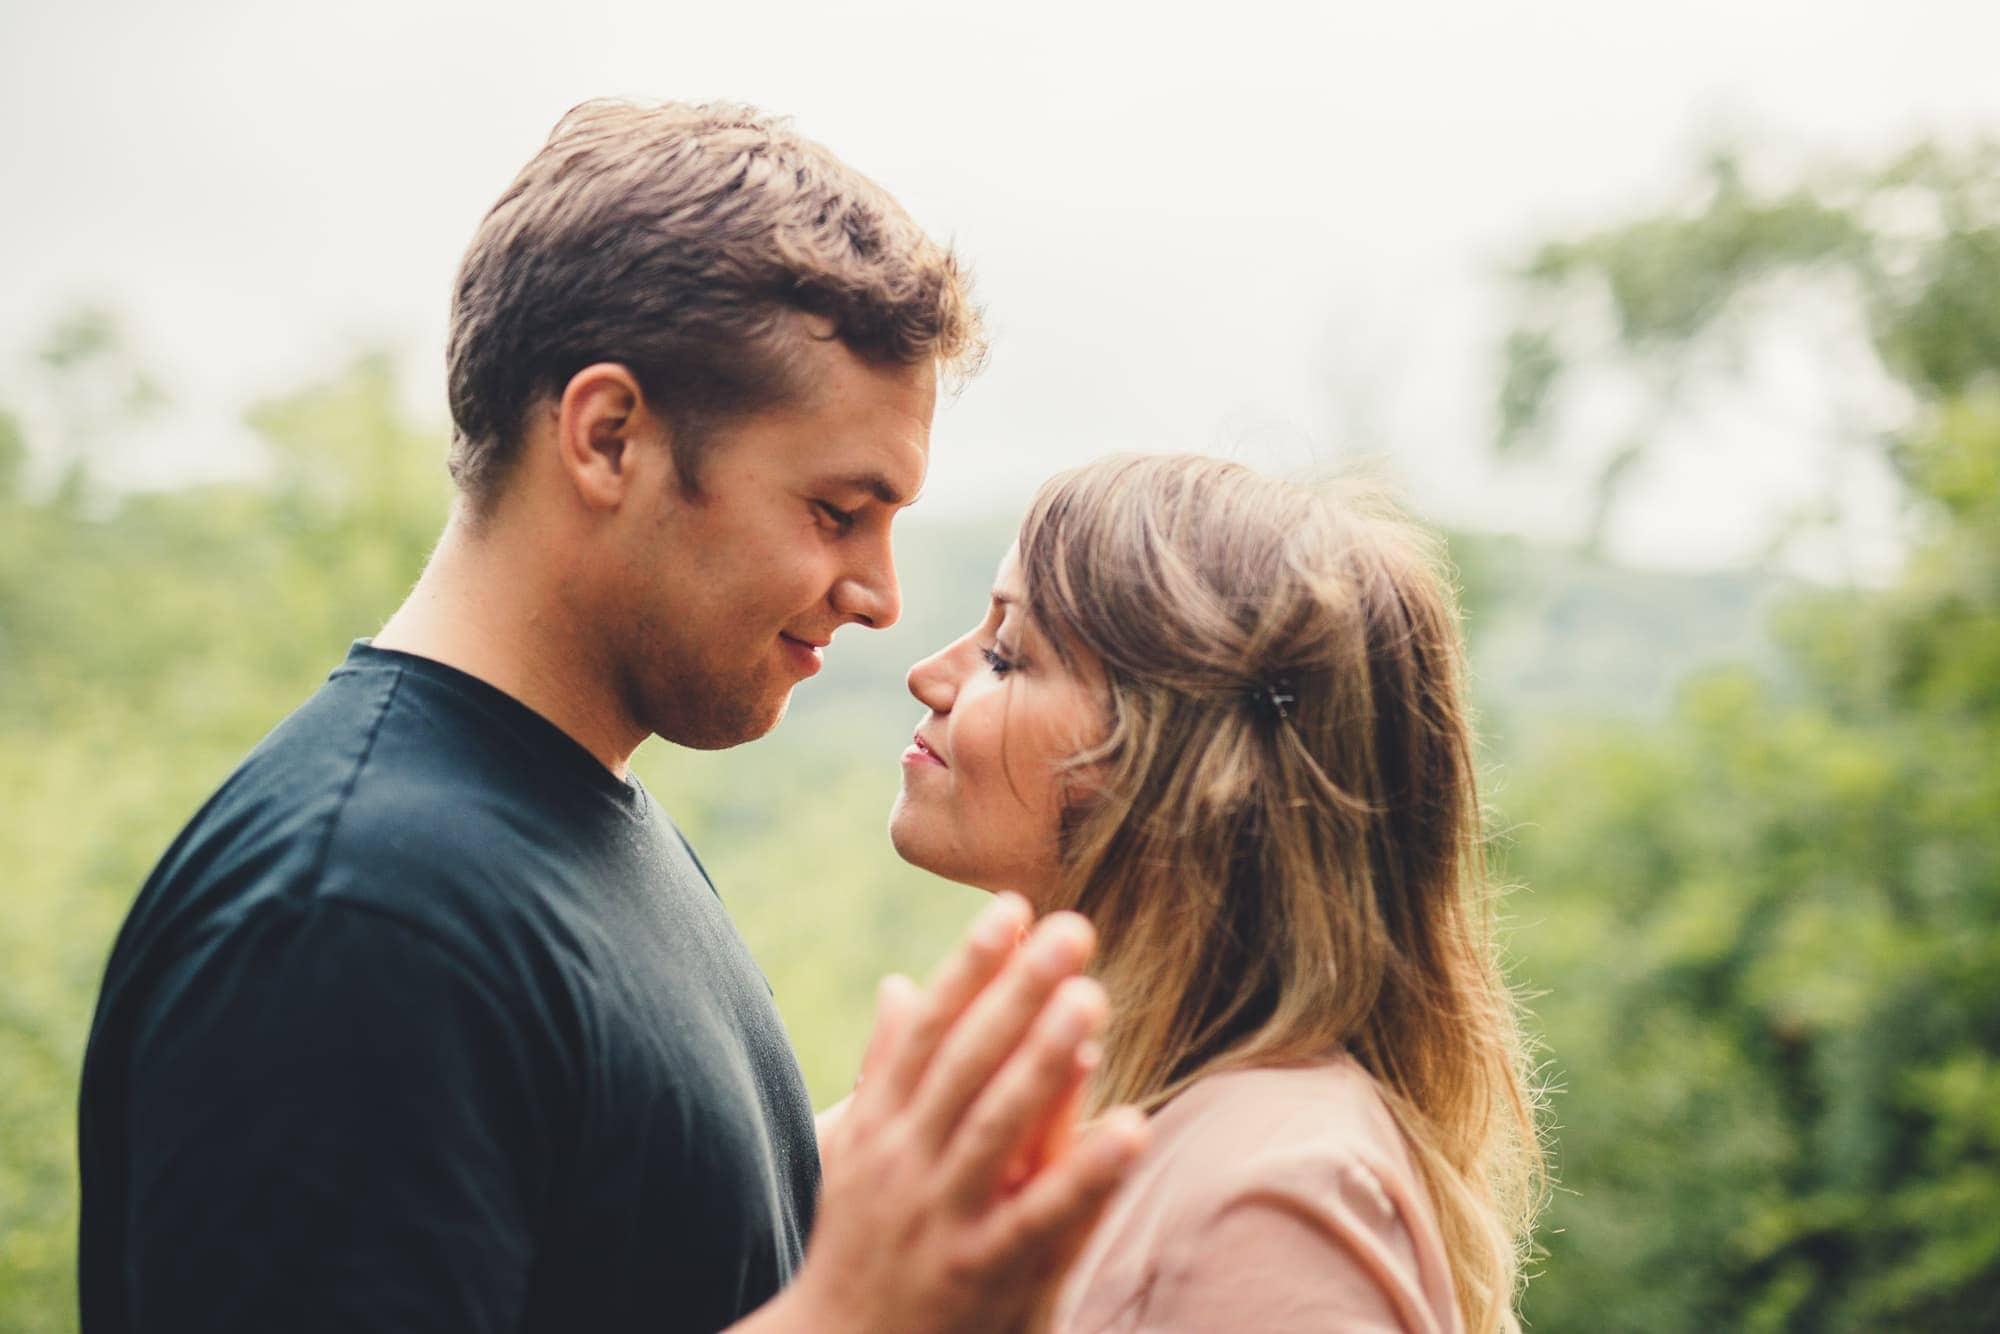 Lickey Hills, Solihull Pre Wedding Engagement Photoshoot – Sarah & Luke